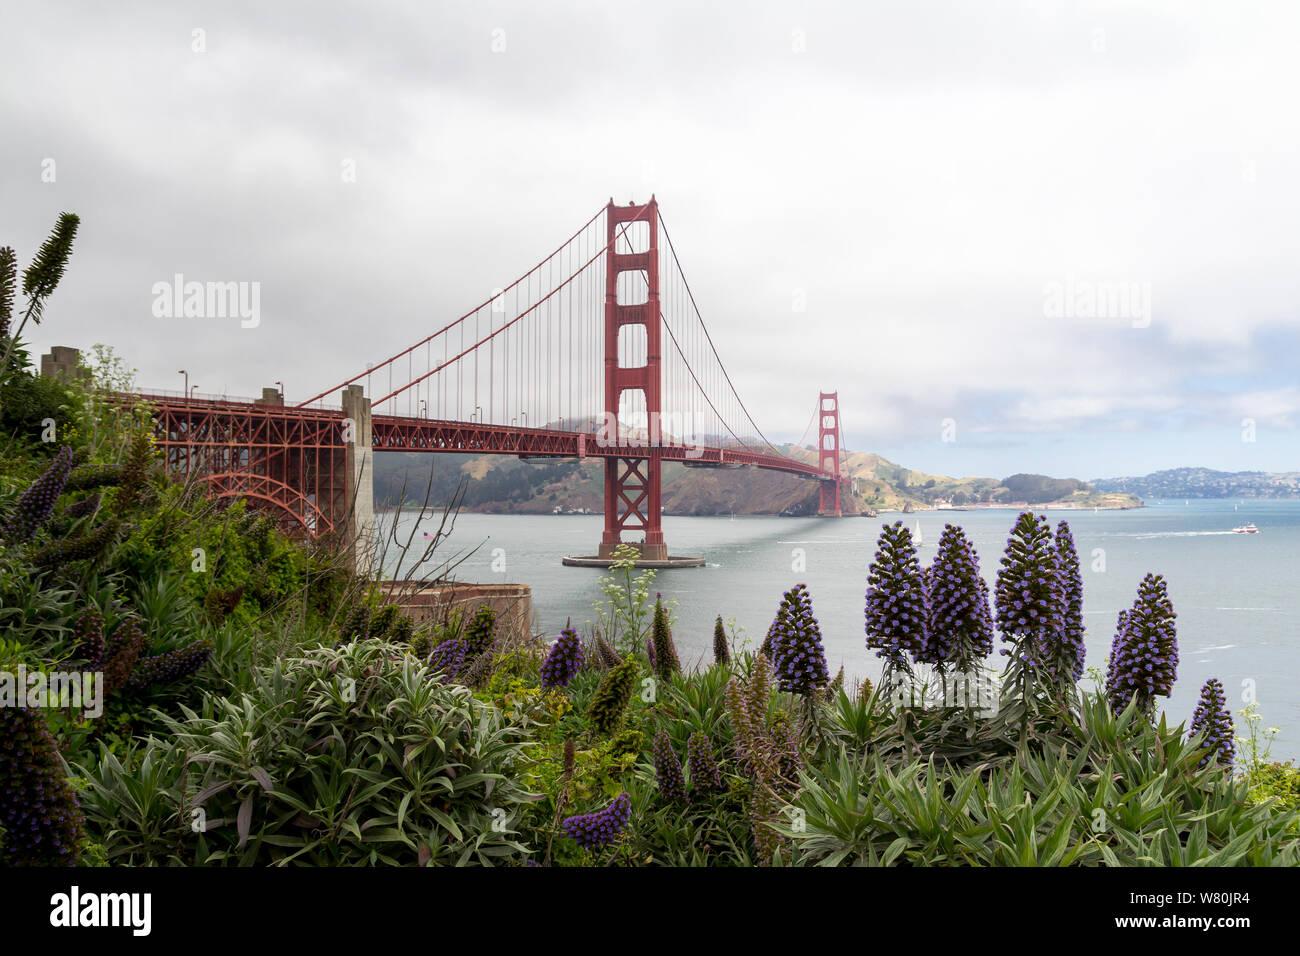 The Golden Gate bridge in San Francisco bay, United States Stock Photo